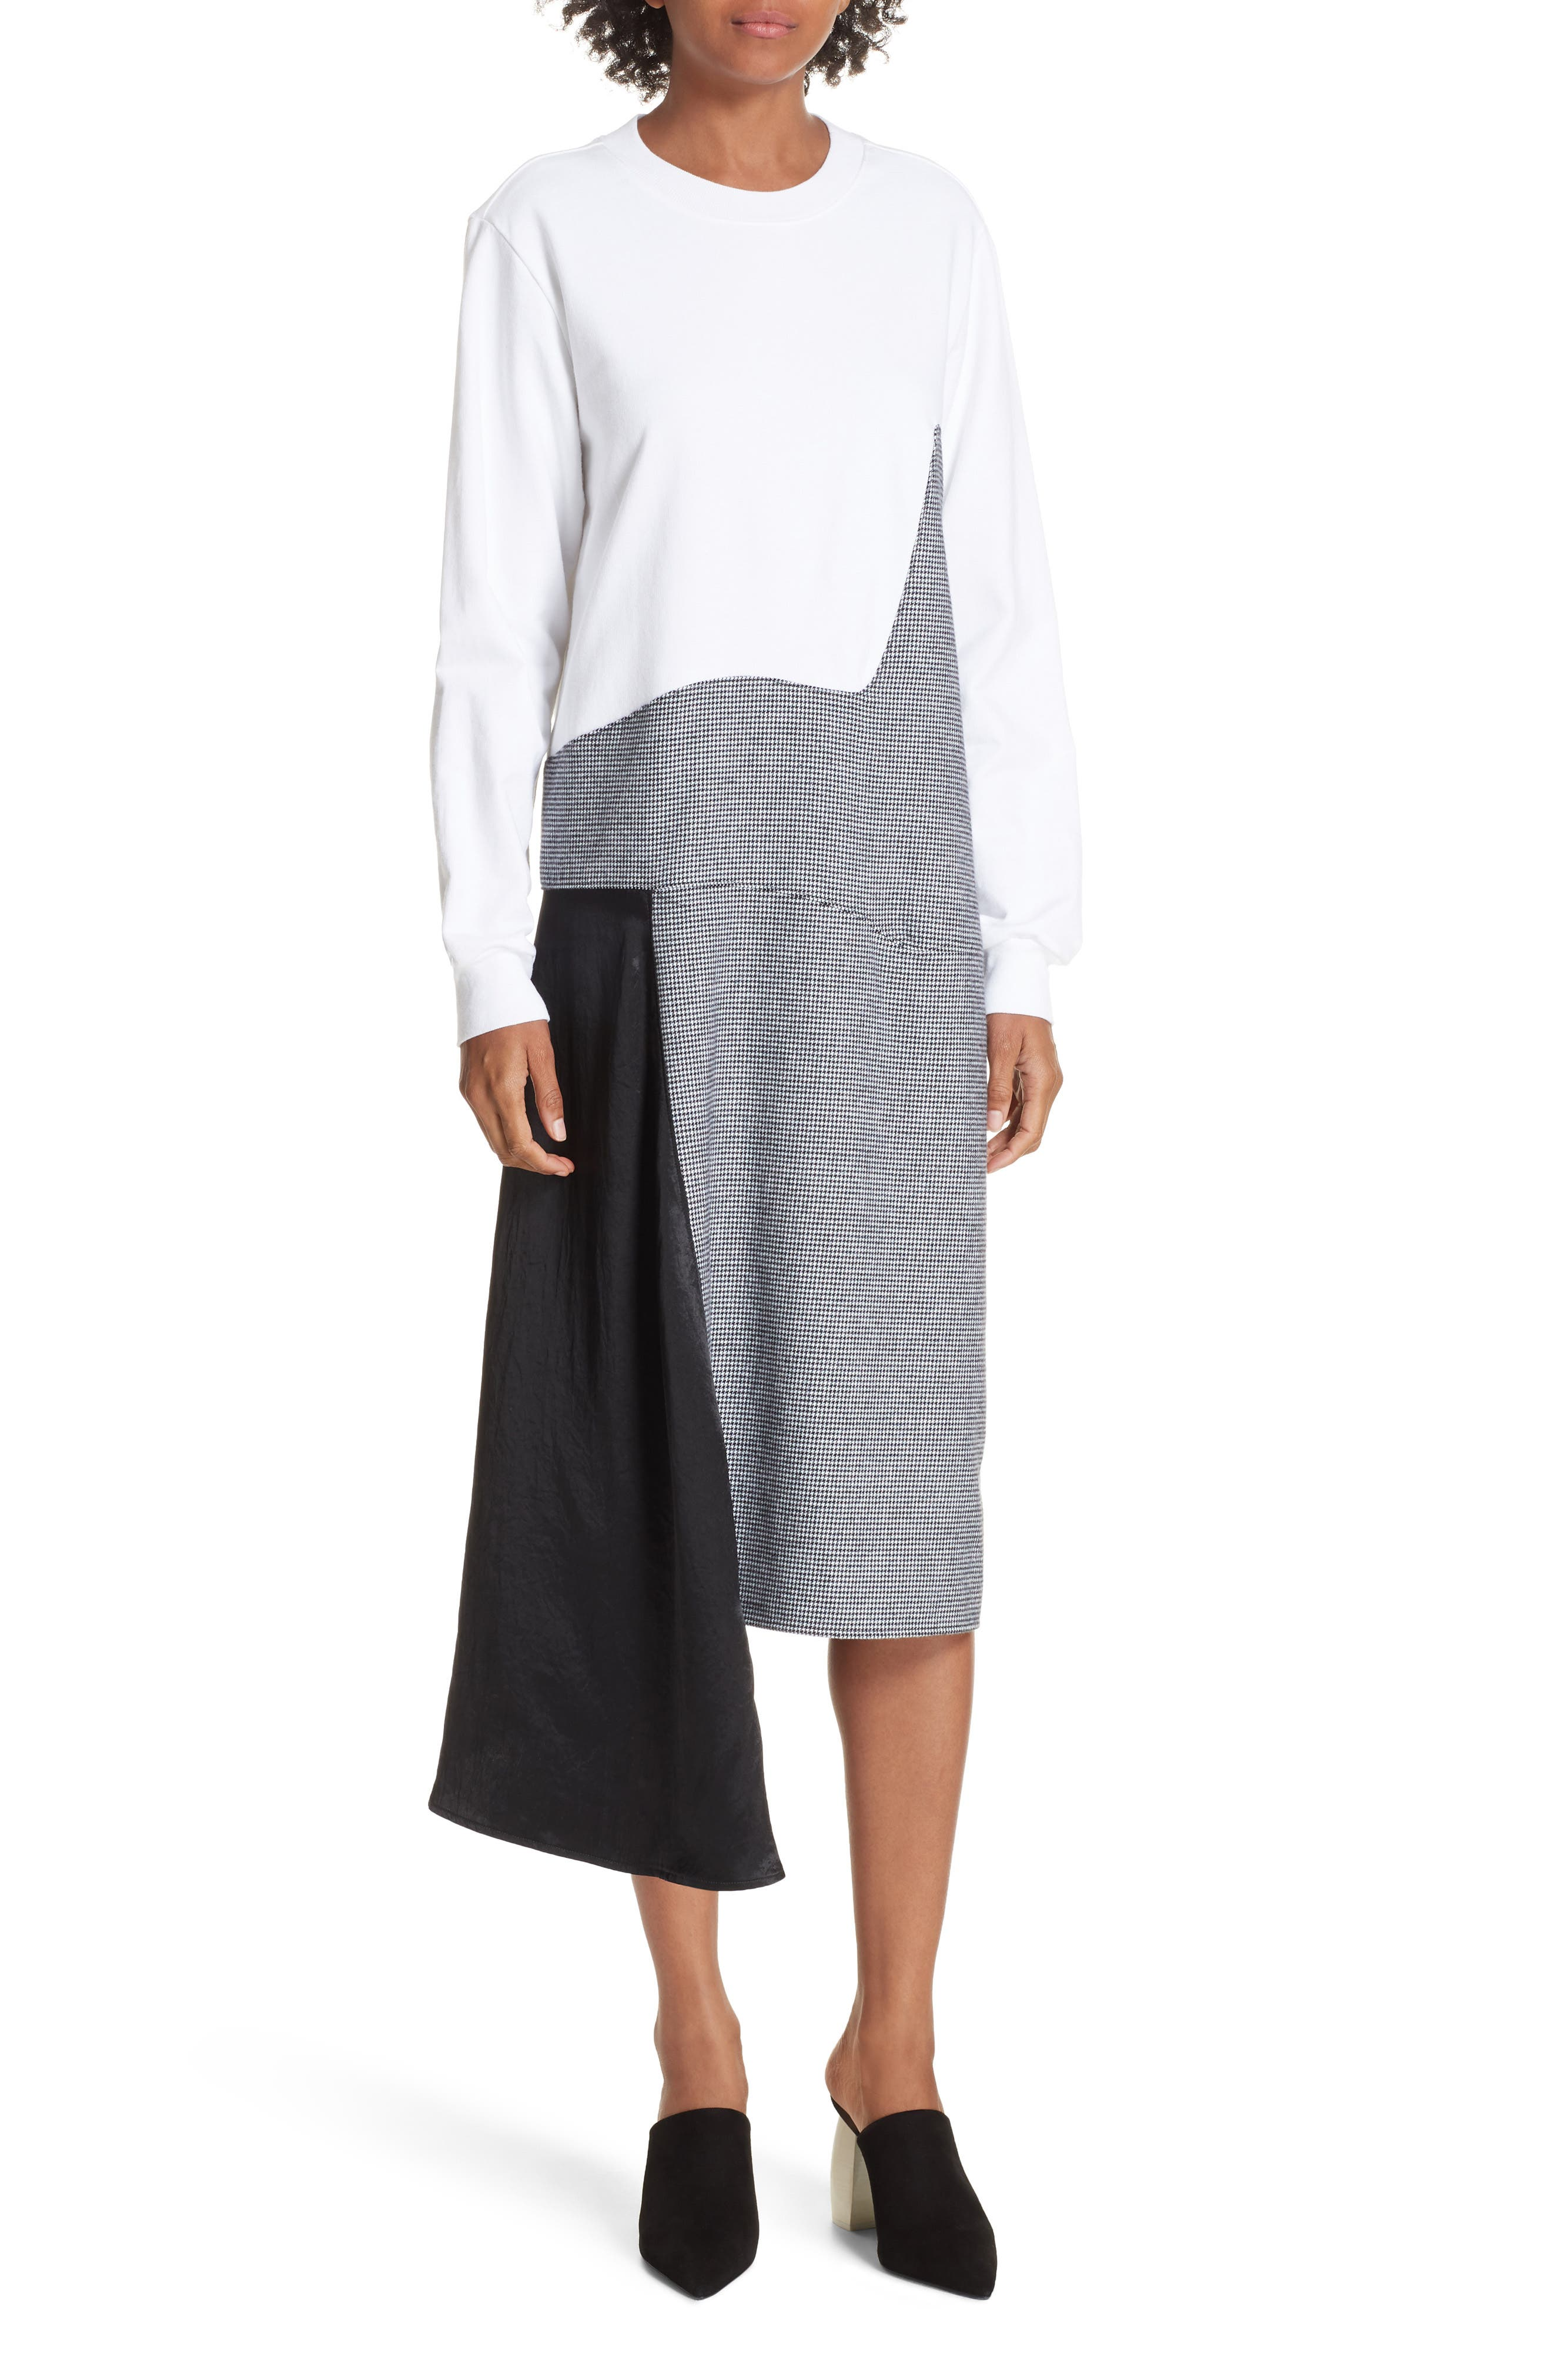 Colorblock Asymmetric Dress,                             Main thumbnail 1, color,                             WHITE/ BLACK